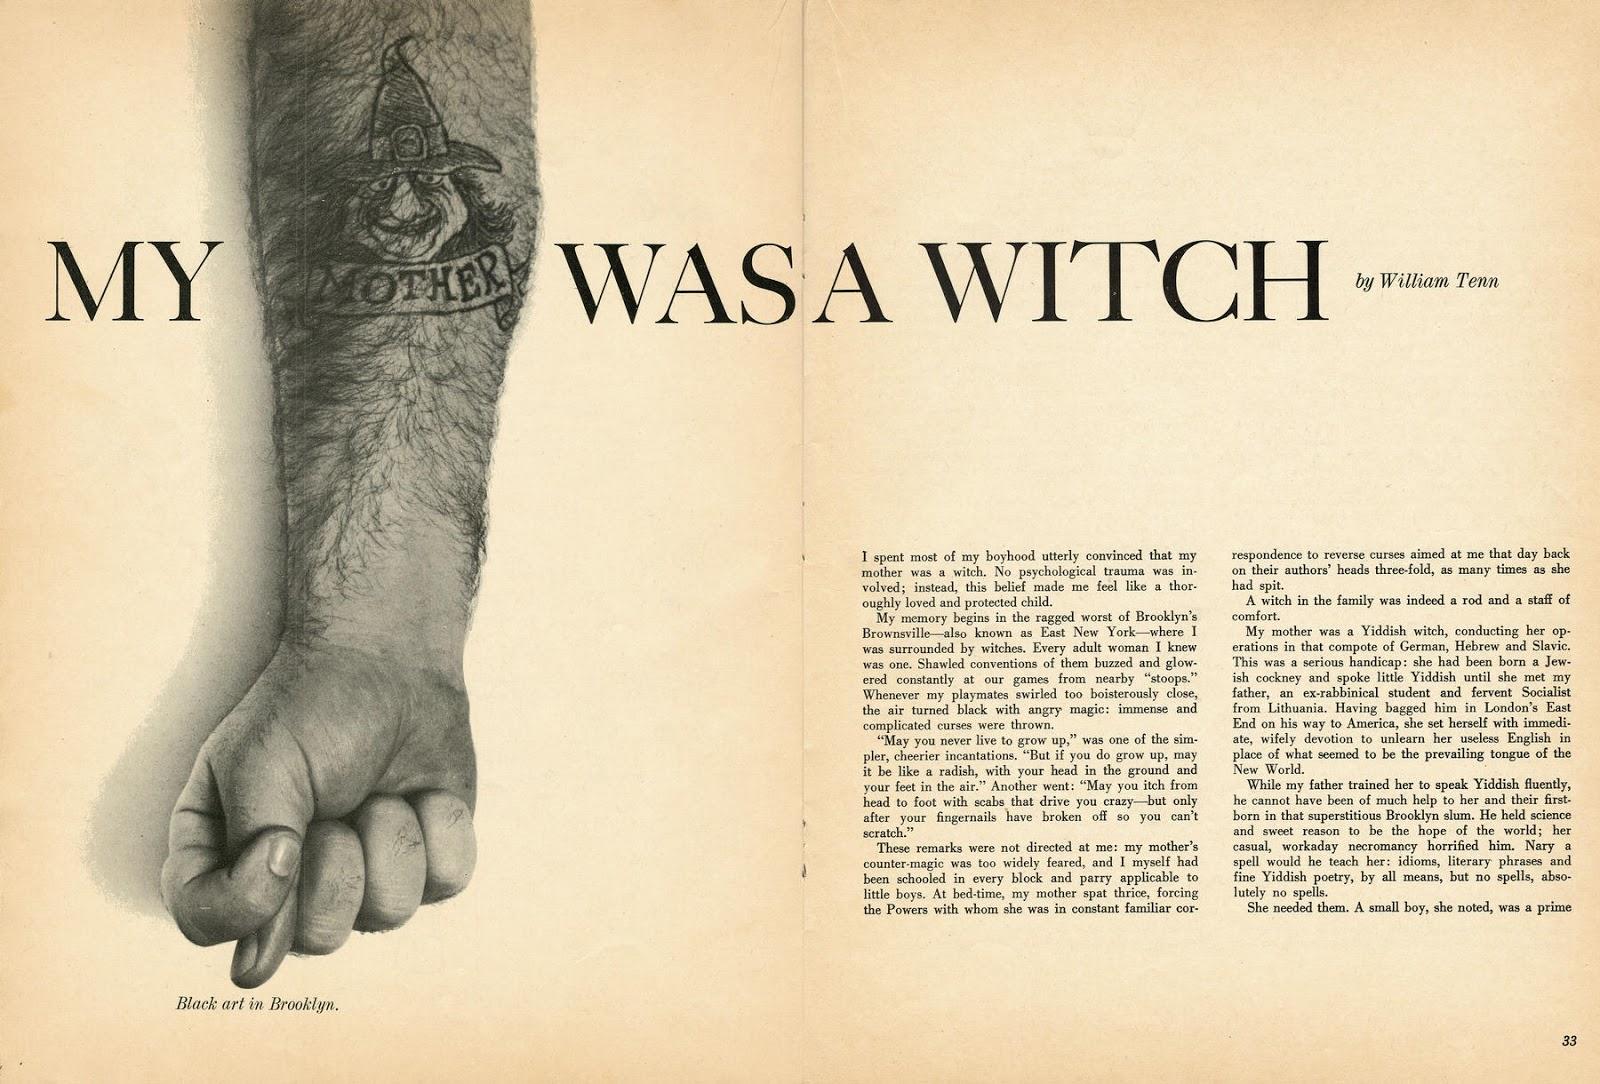 jean shepherd essay (jean shepherd, the endless unpopular essays, 1950) nordquist, richard contrast composition and rhetoric thoughtco, jun 20, 2017.